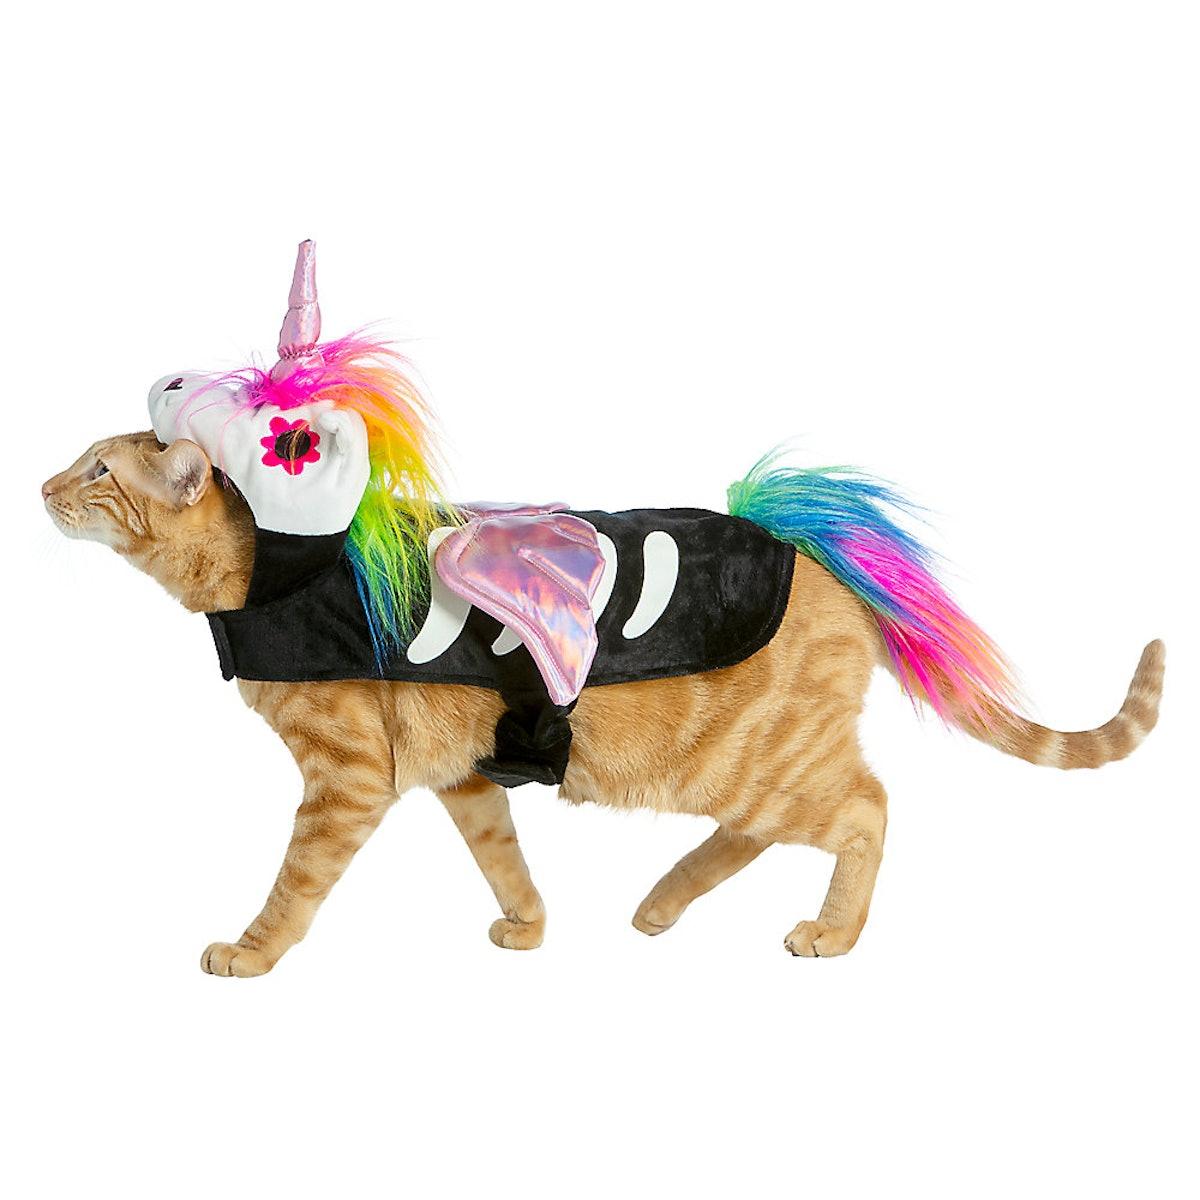 Thrills & Chills Halloween Skeleton Unicorn Cat & Dog Costume